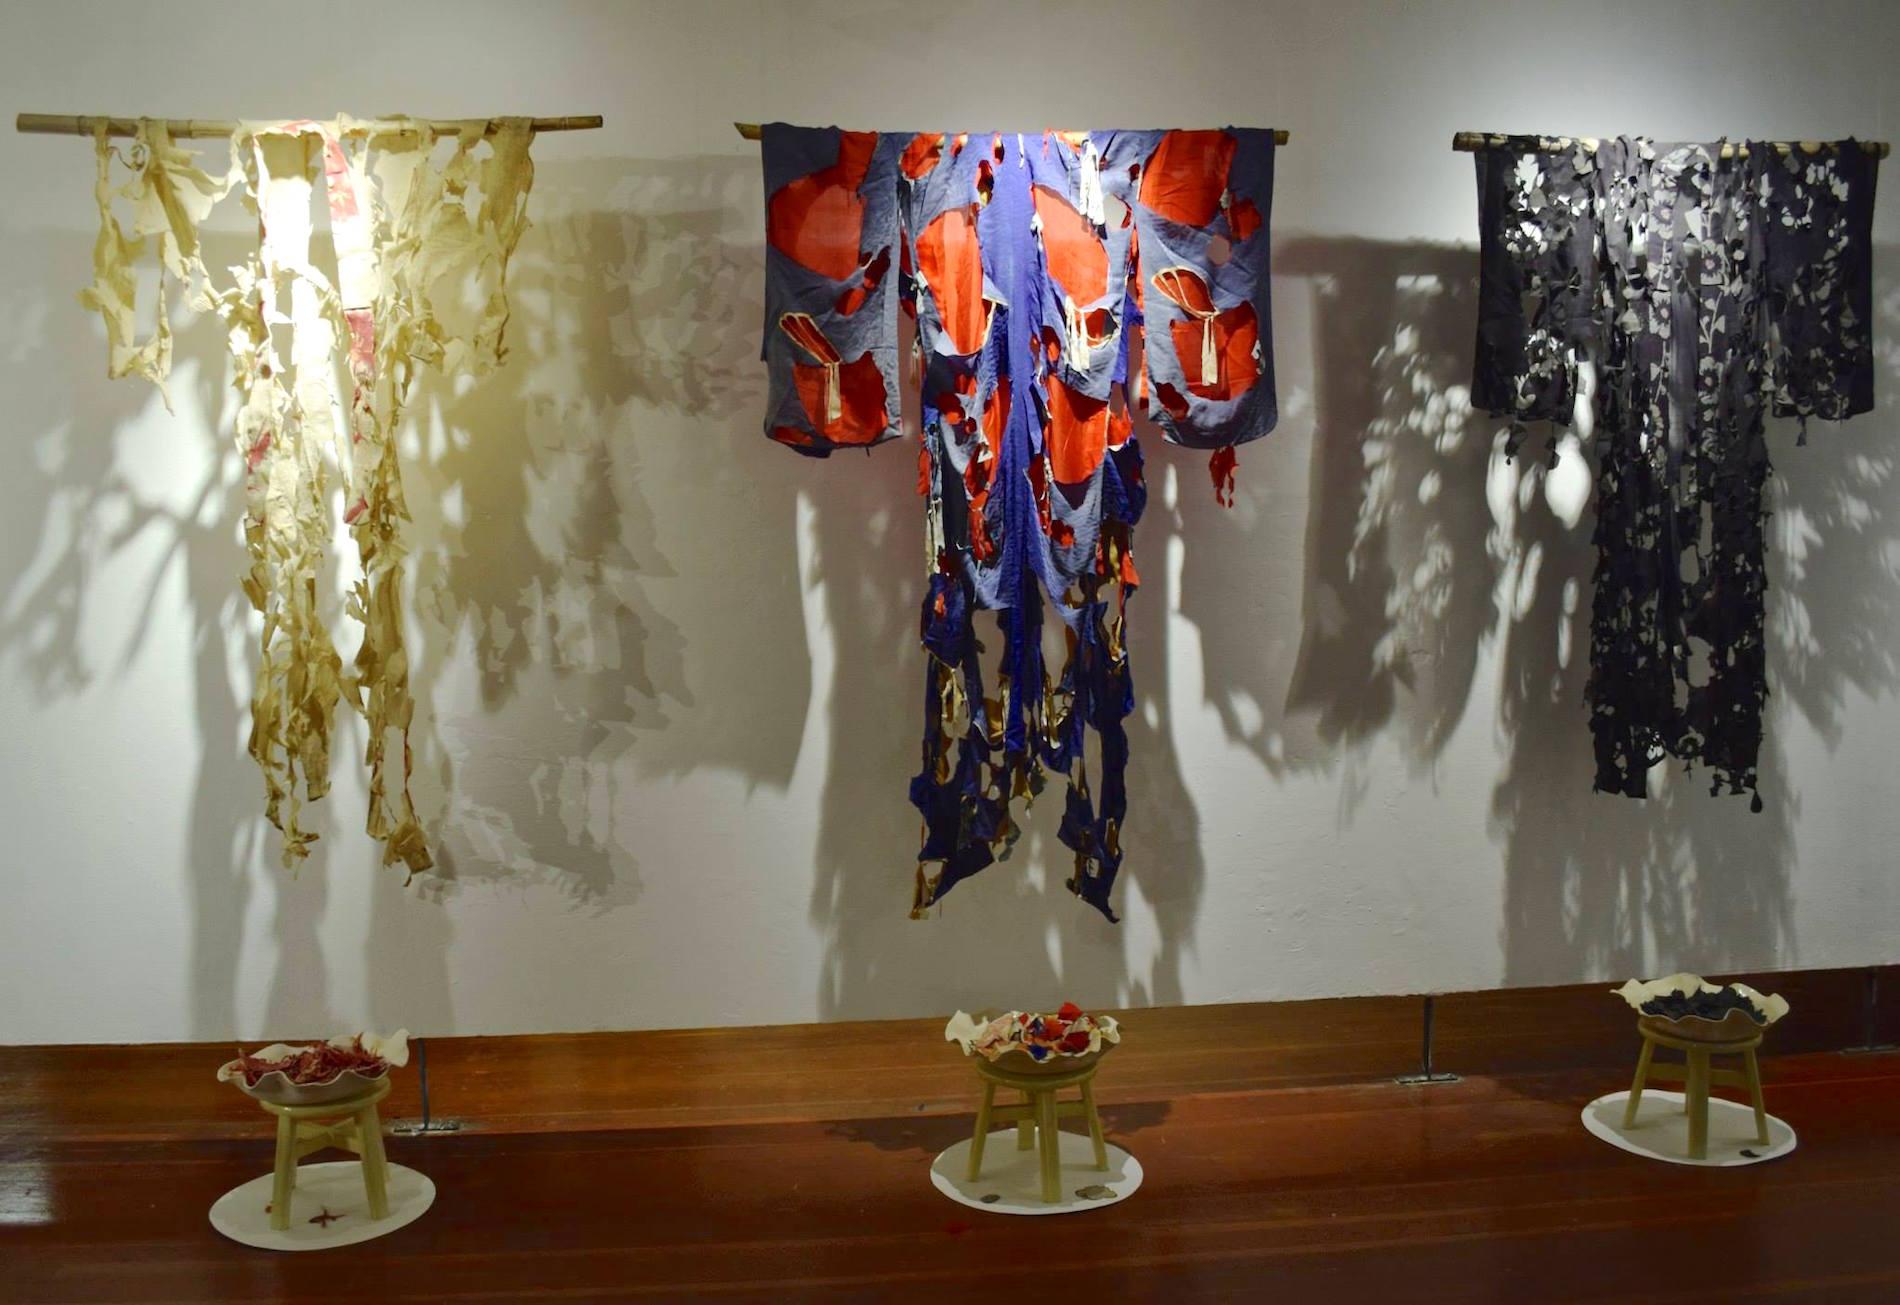 Deconstructed Kimono installation